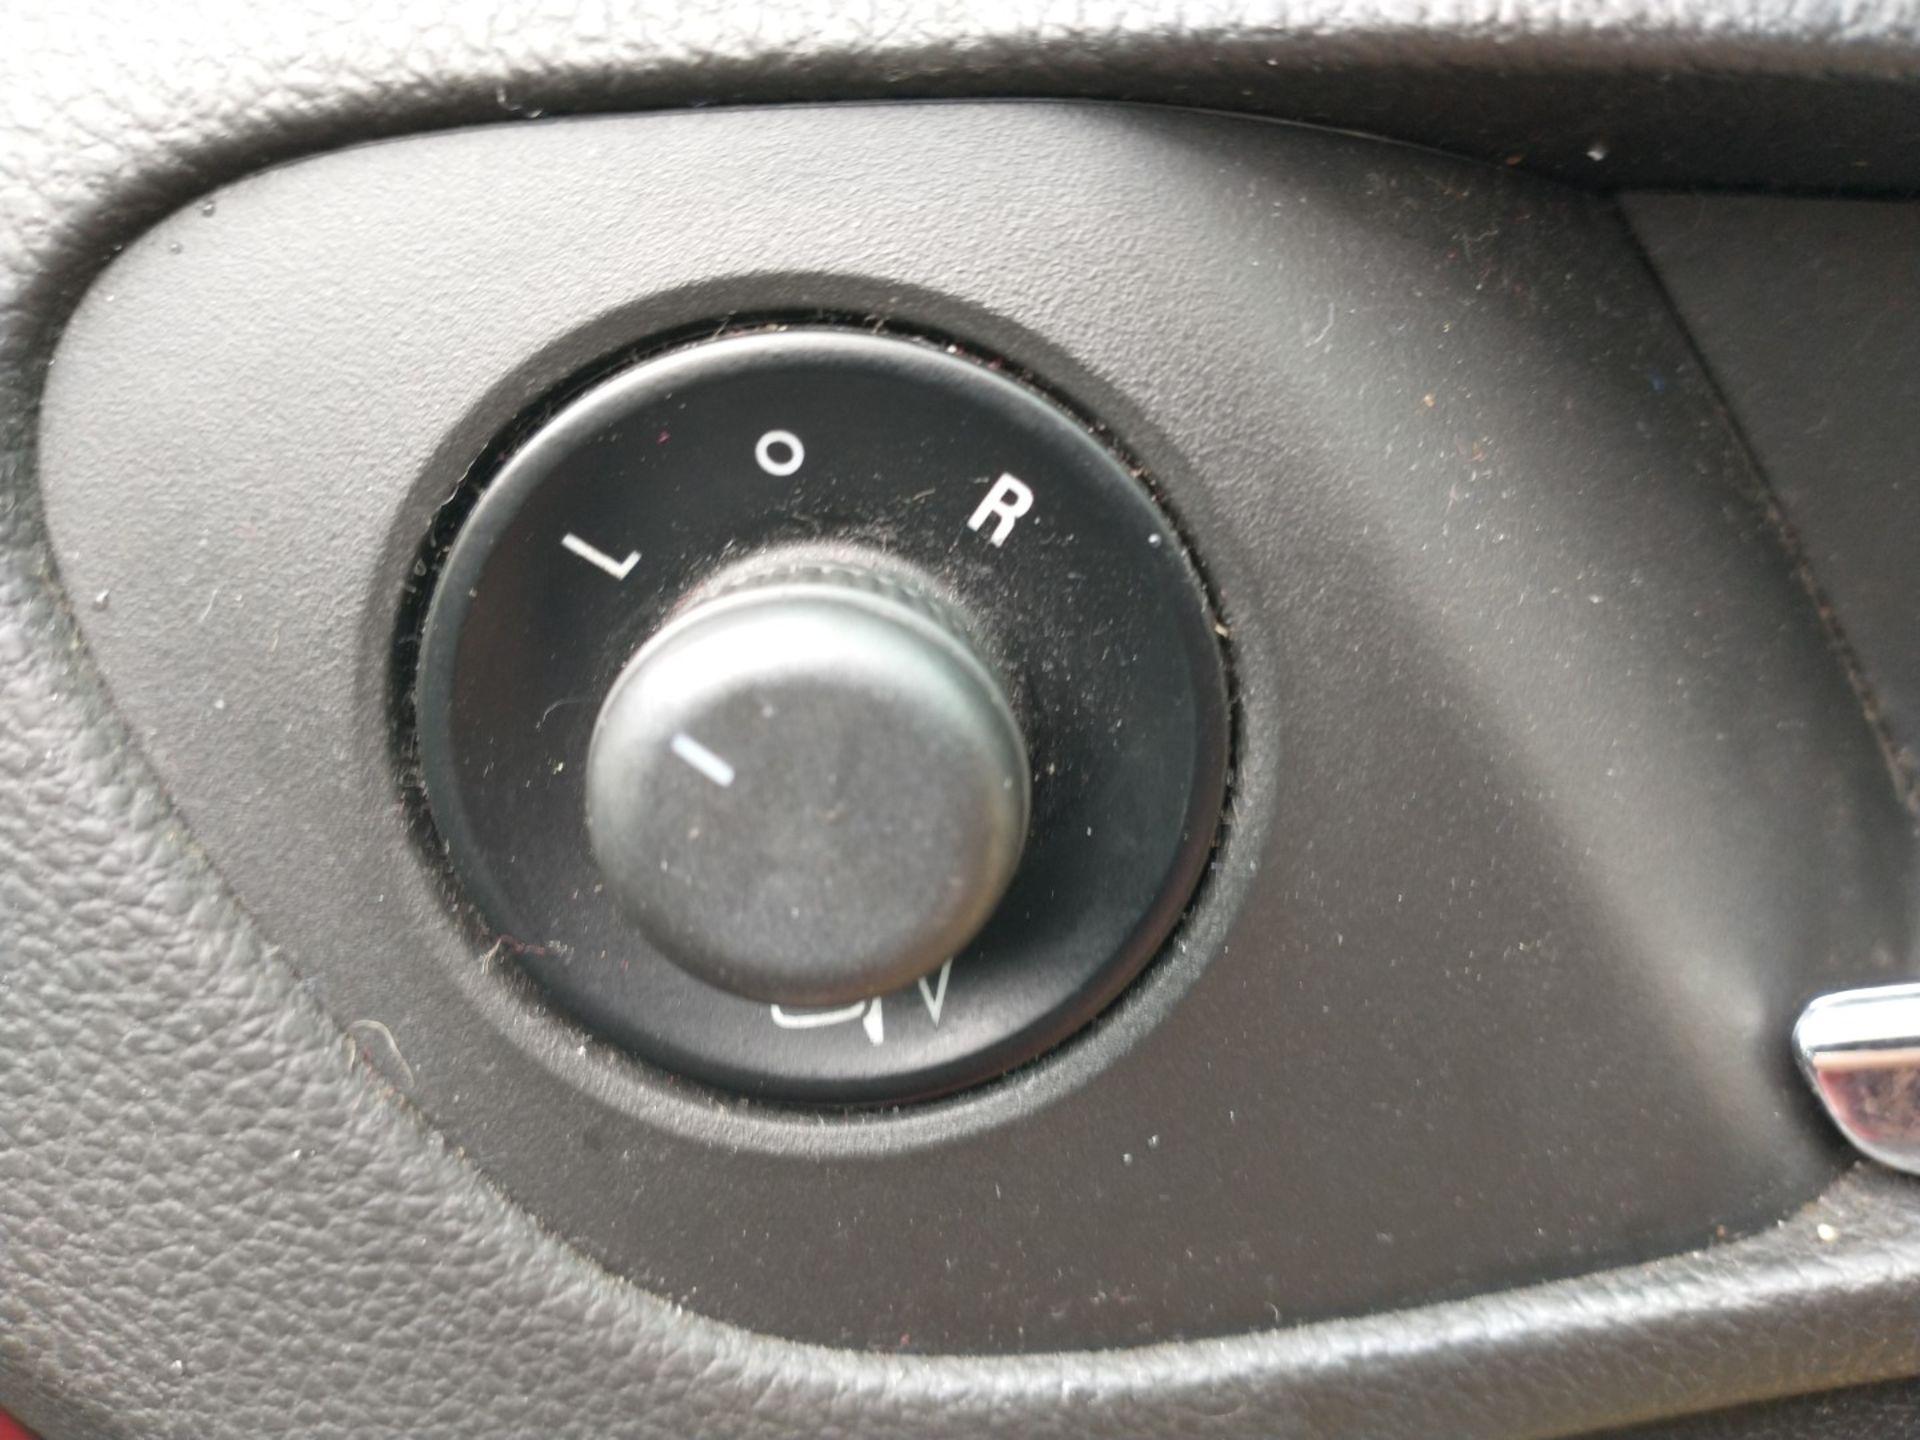 2009 Vauxhall Insignia Elite Nav CDTI 5dr 2.0 Diesel - CL505 - NO VAT ON THE HAMMER - Location: Corb - Image 13 of 22